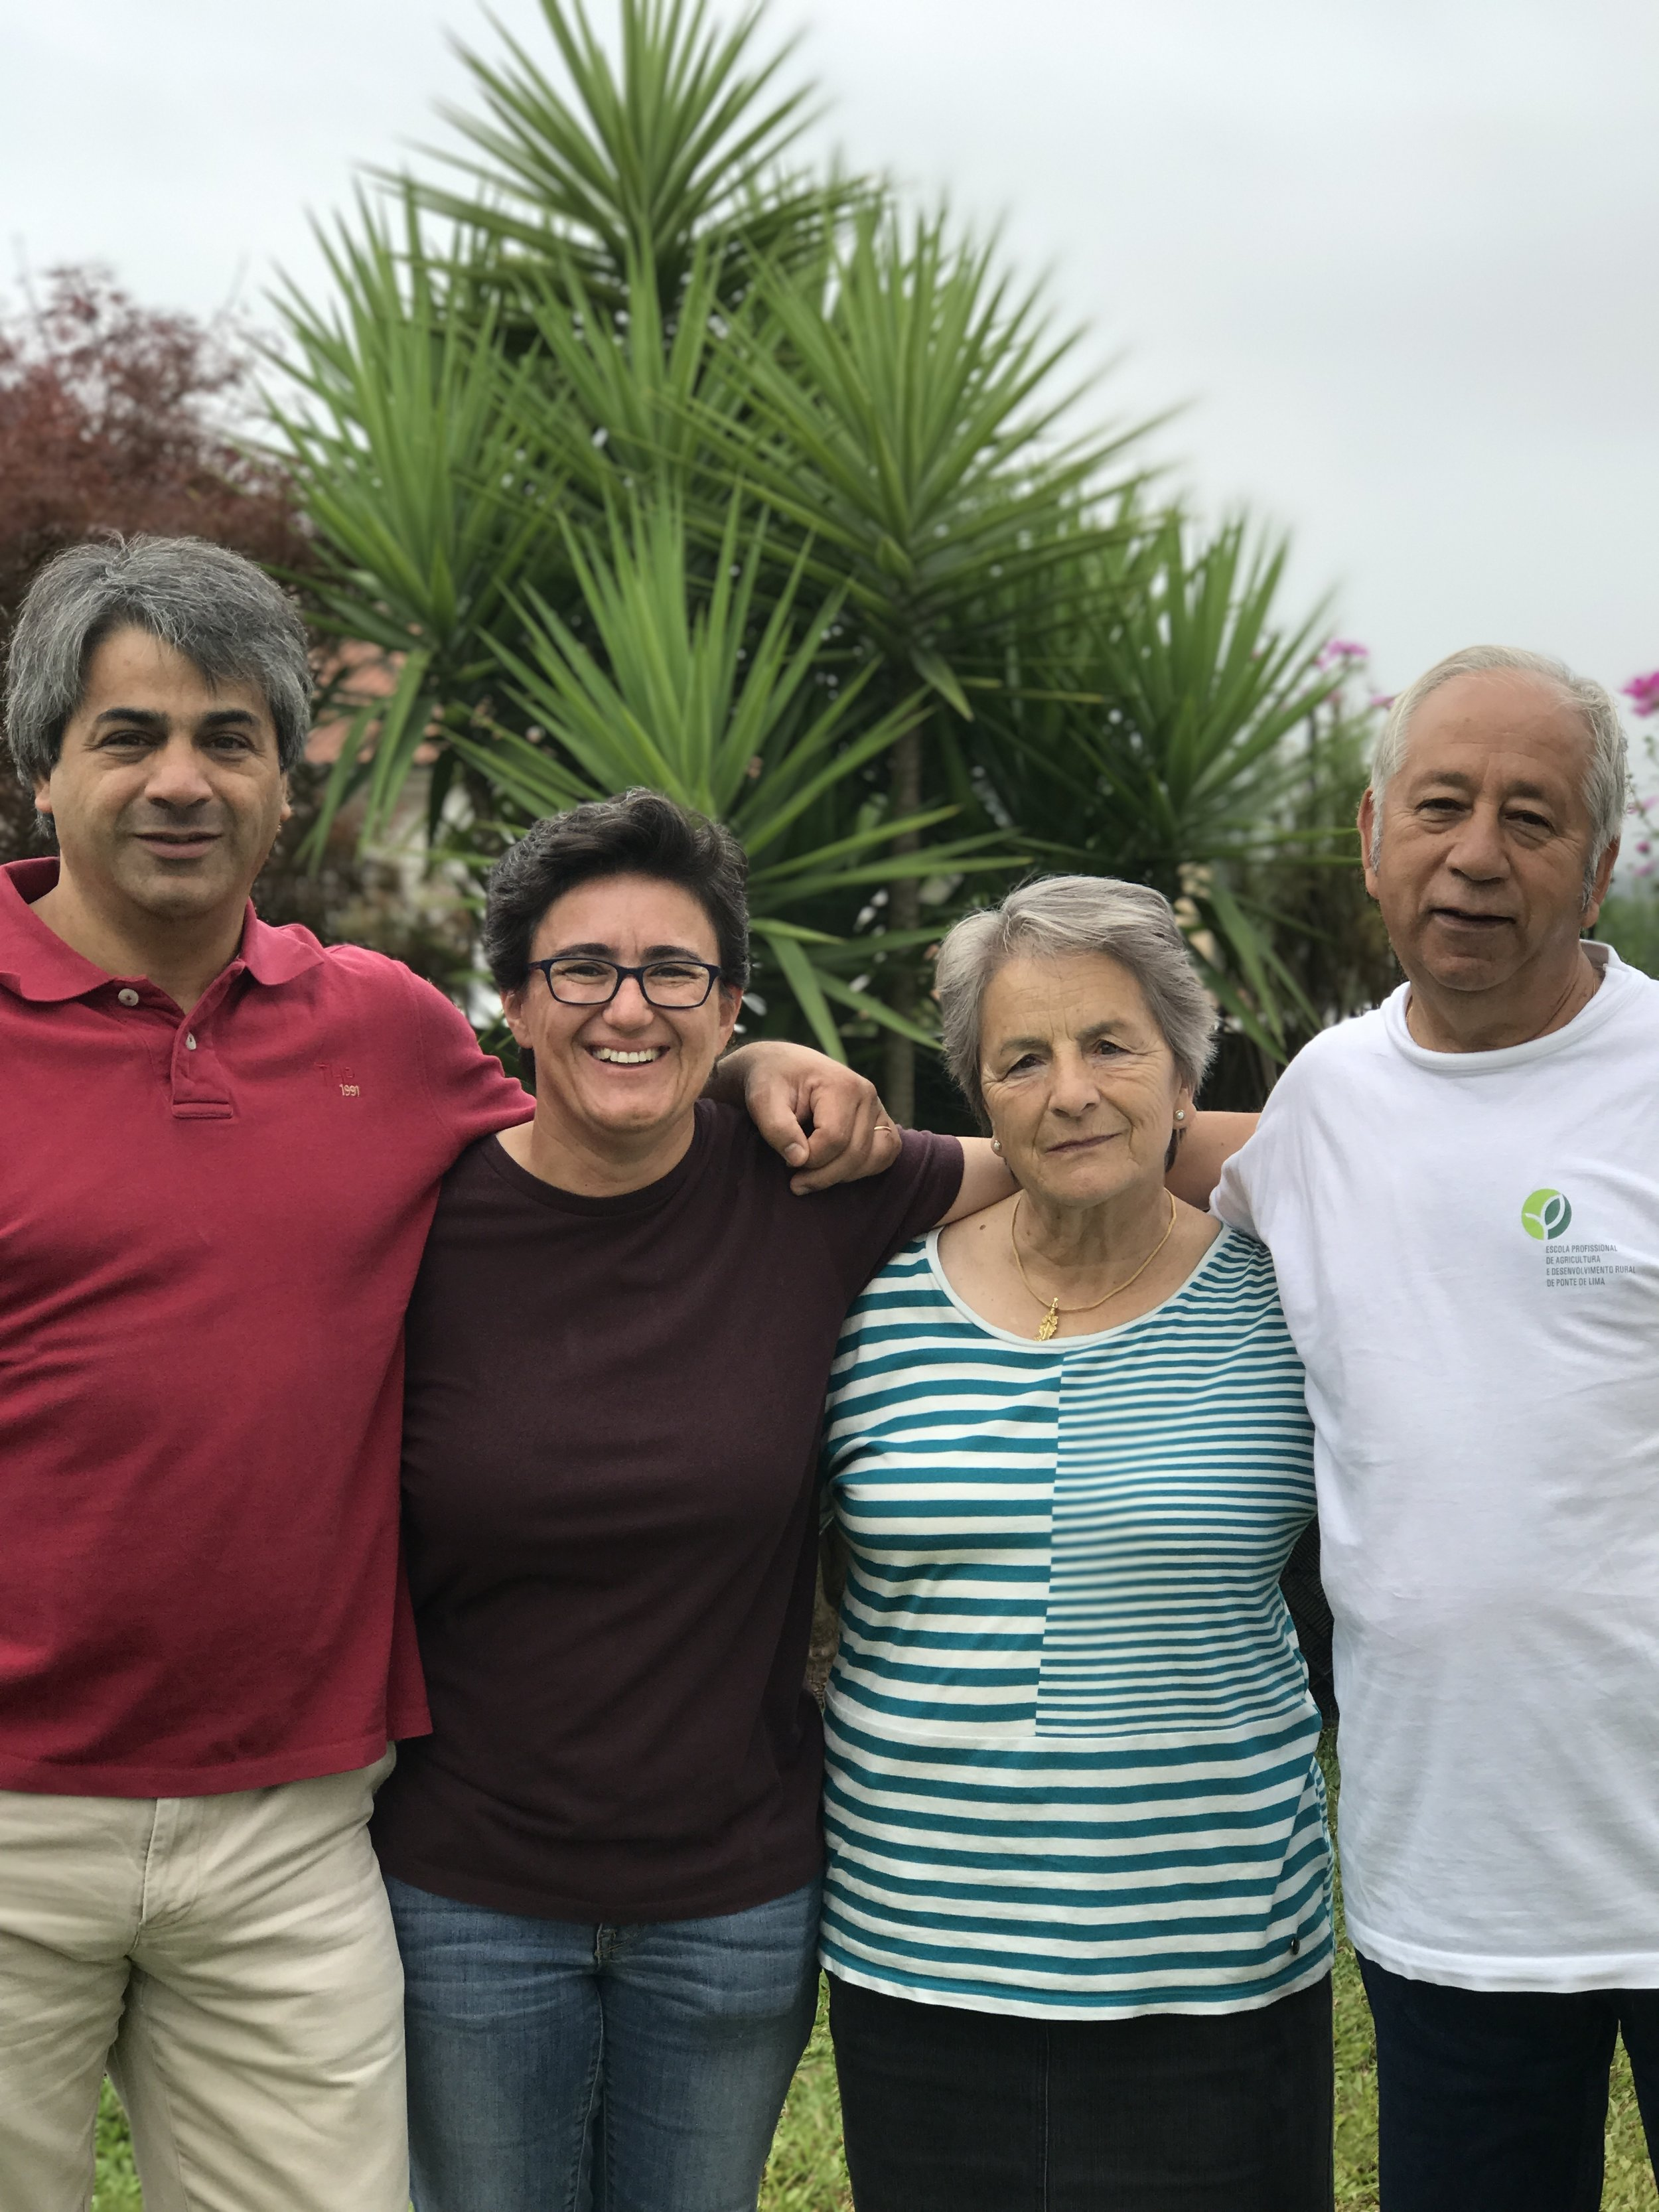 From left: Cousin Miguel, Paula, Tia Loreta, Tio Luis